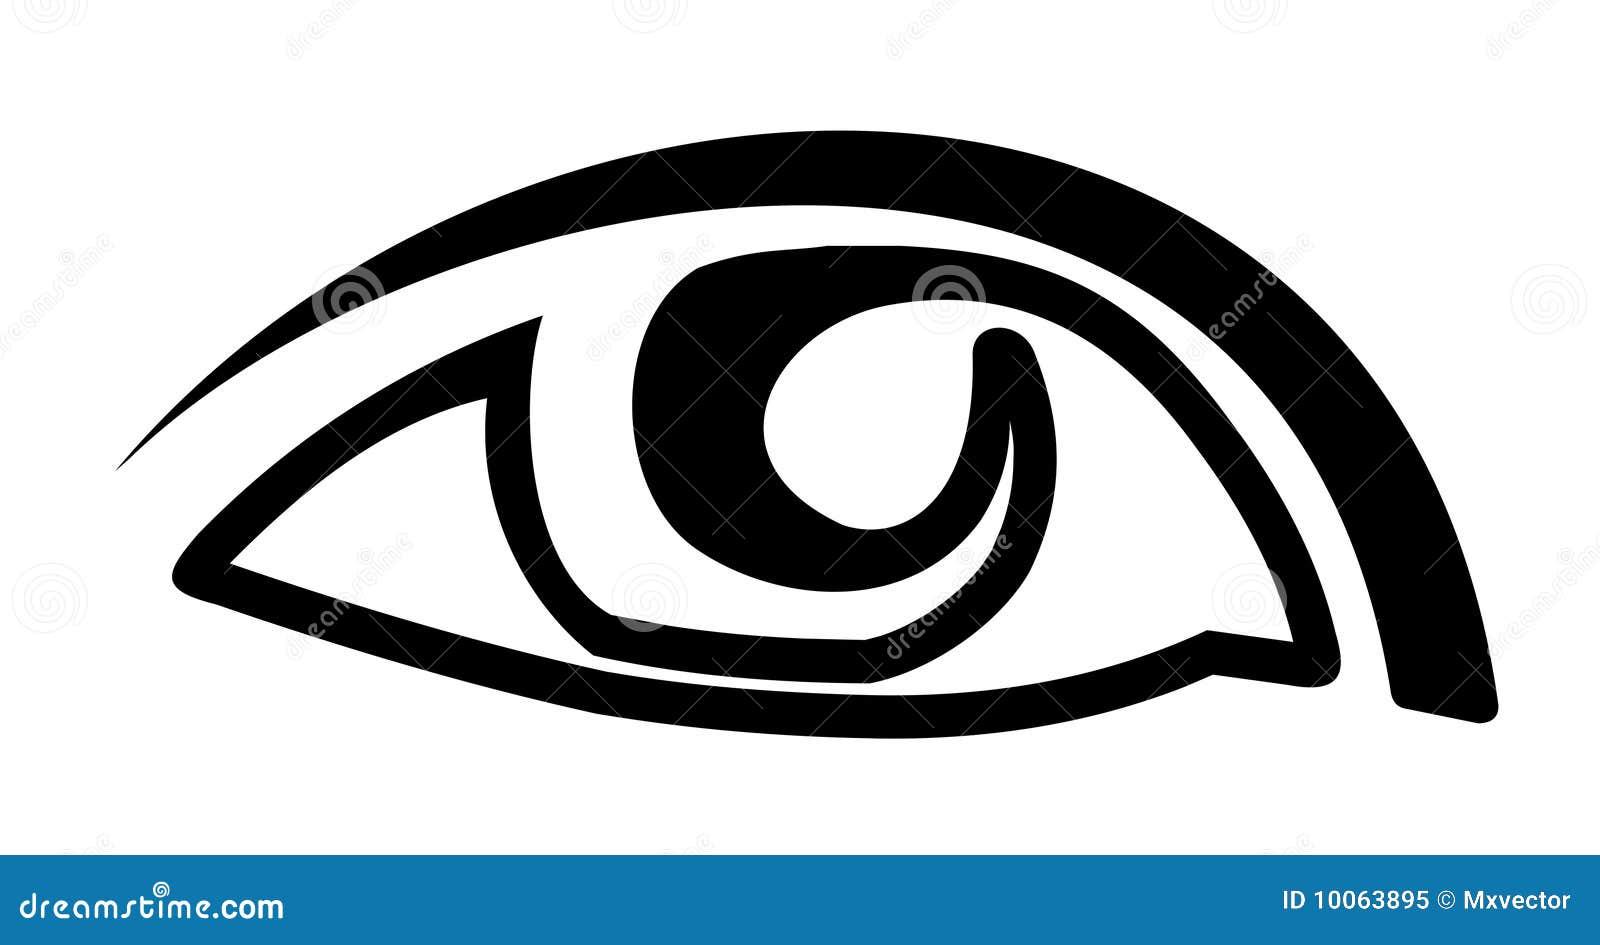 Vetor do olho